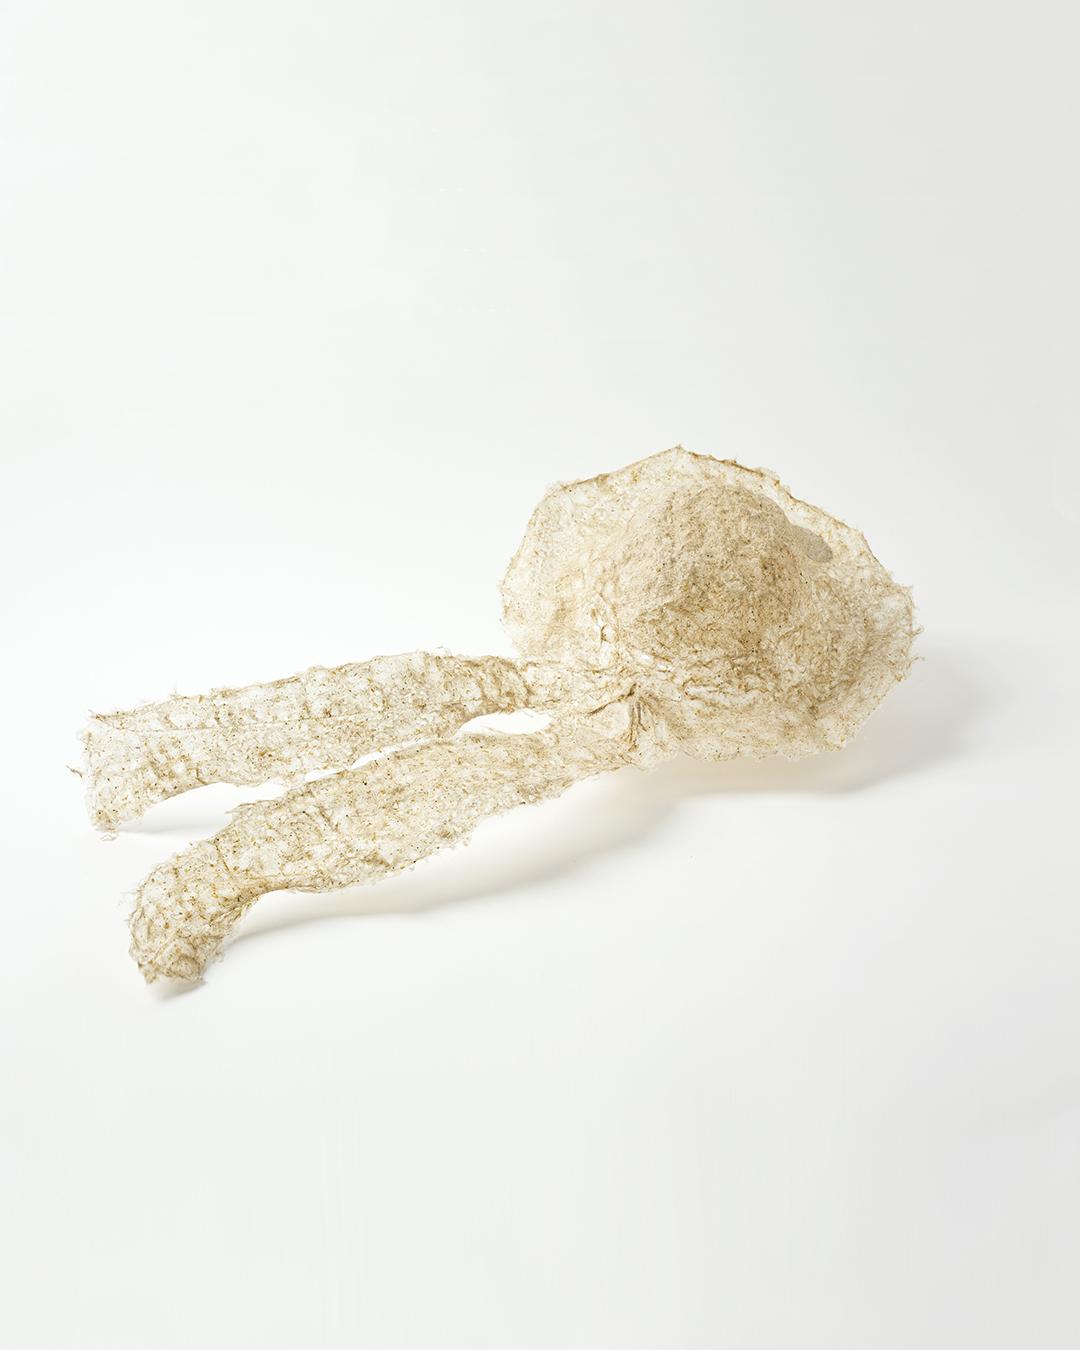 Annamaria Leiste, Behütet (Guarded) - P, 2019, brooch; silver, dandelion, linters, abaca, 680 x 310 x 120 mm, €420